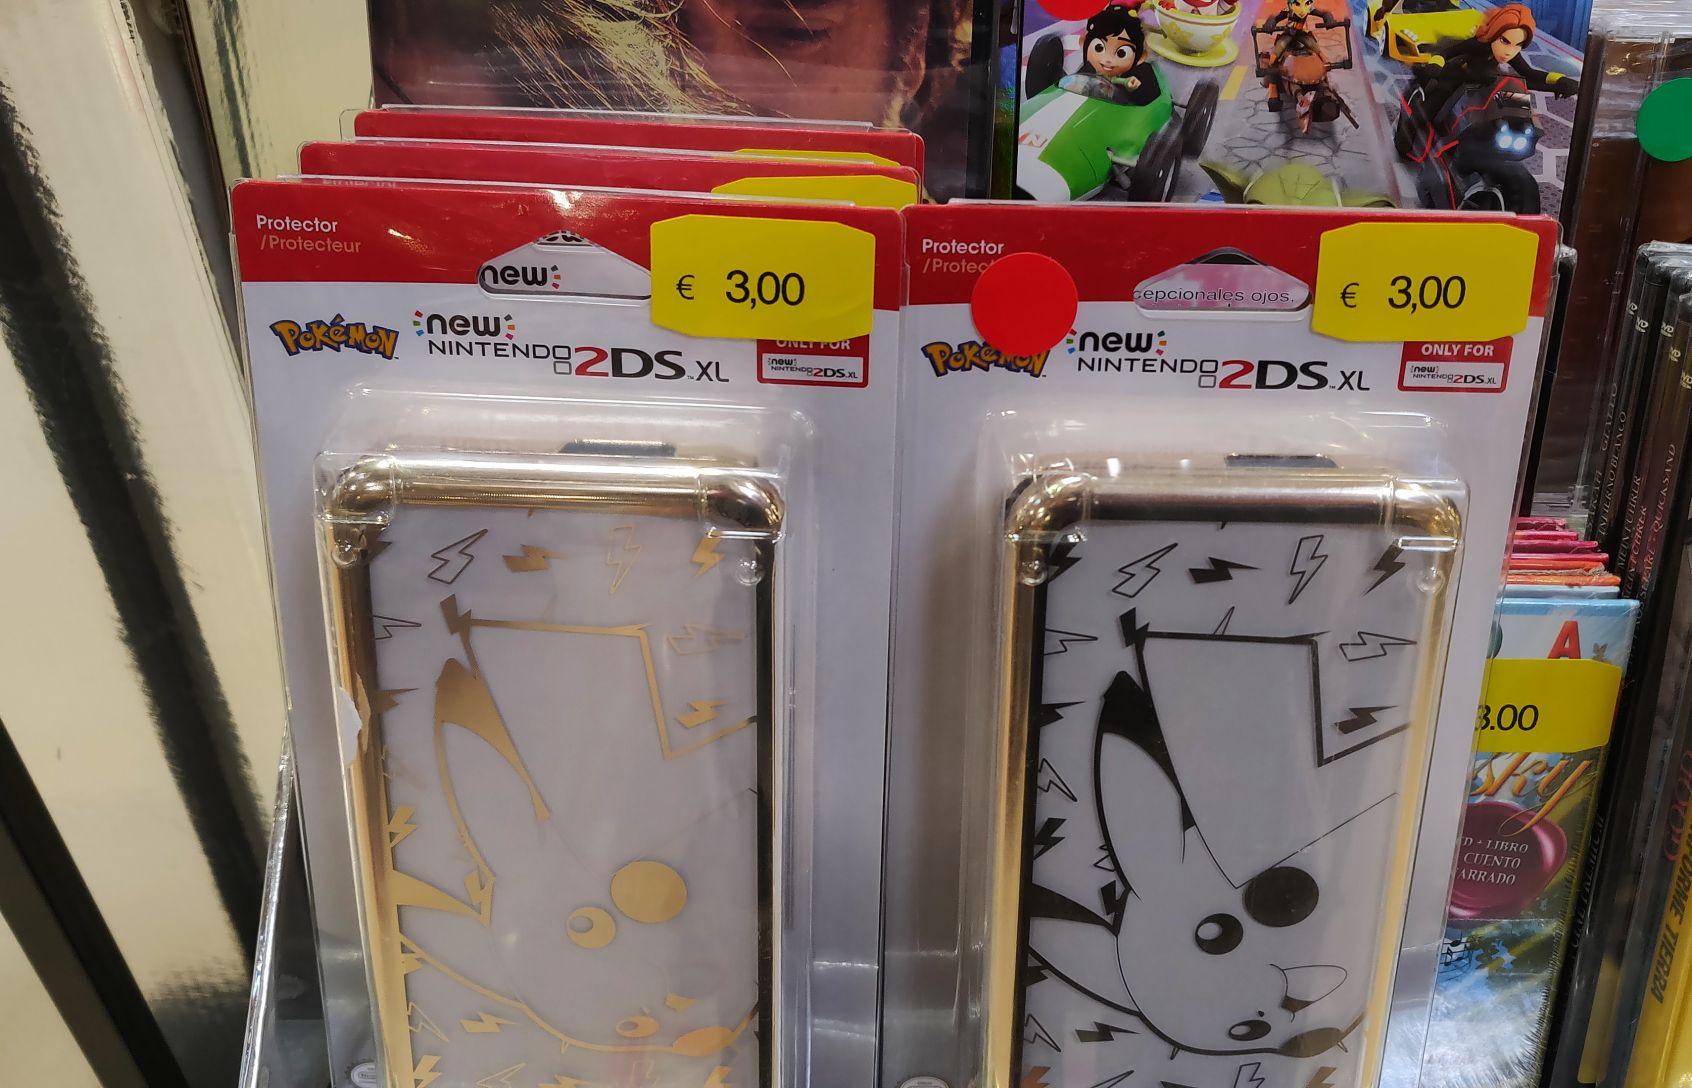 Carcasa Pikachu para New Nintendo 2DS XL (Eroski Bilbondo)